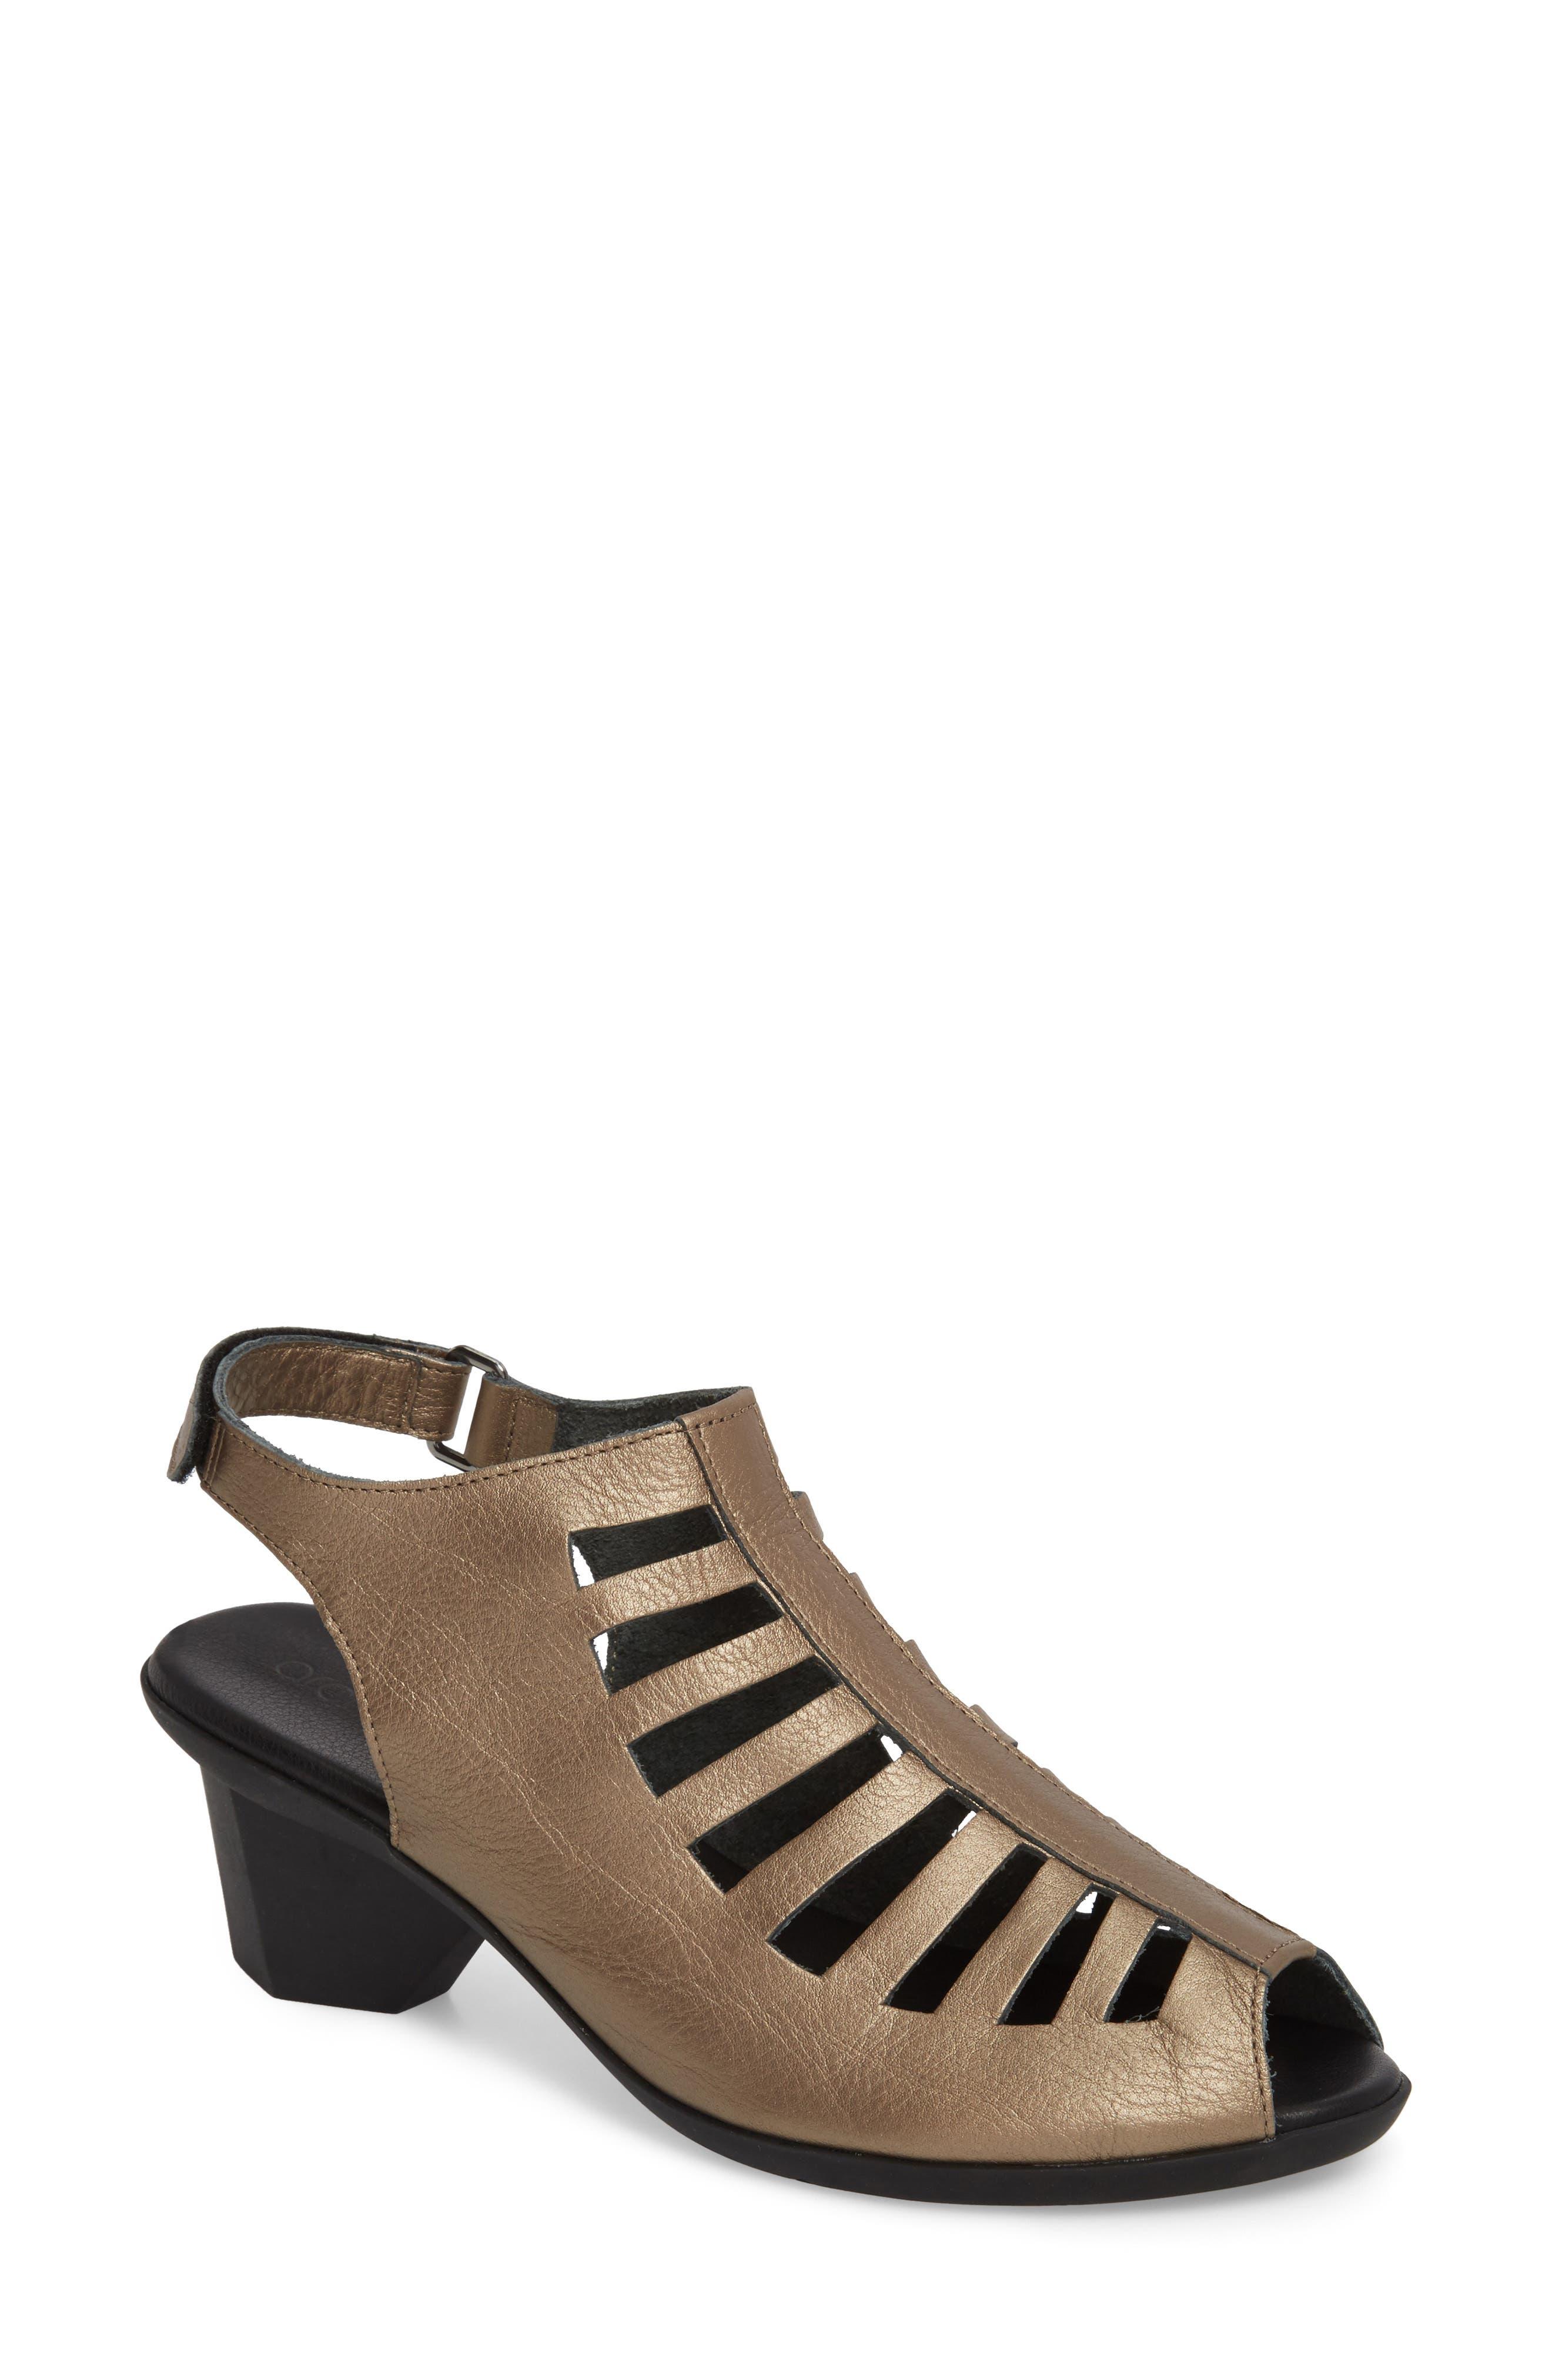 Enexor Sandal,                             Main thumbnail 1, color,                             Moon/ Noir Leather